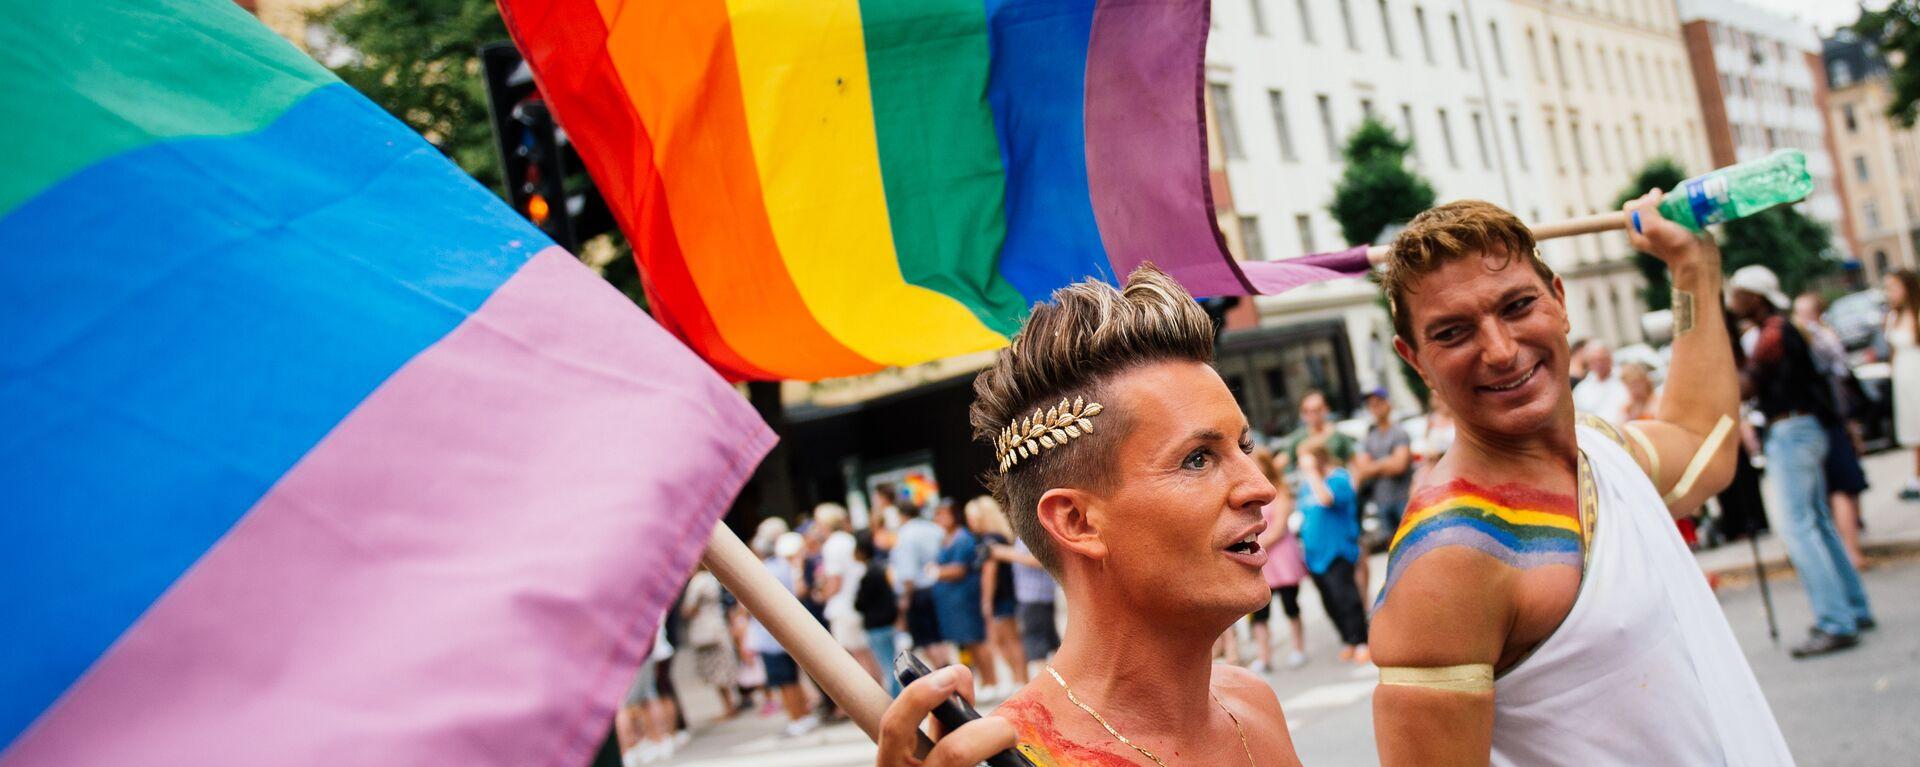 LGBT - Sputnik Polska, 1920, 11.03.2021